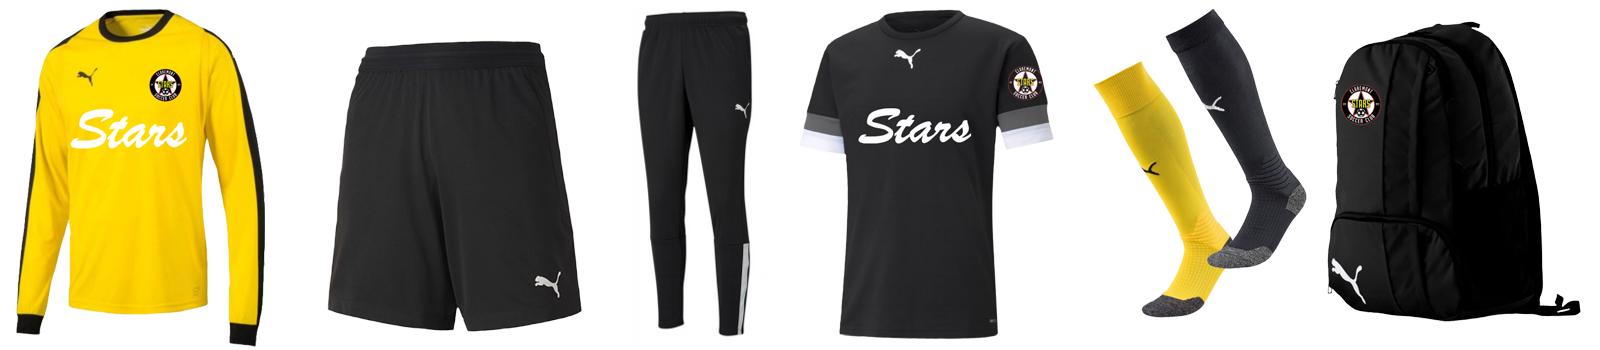 goalie-kit-strip-edited-2.png